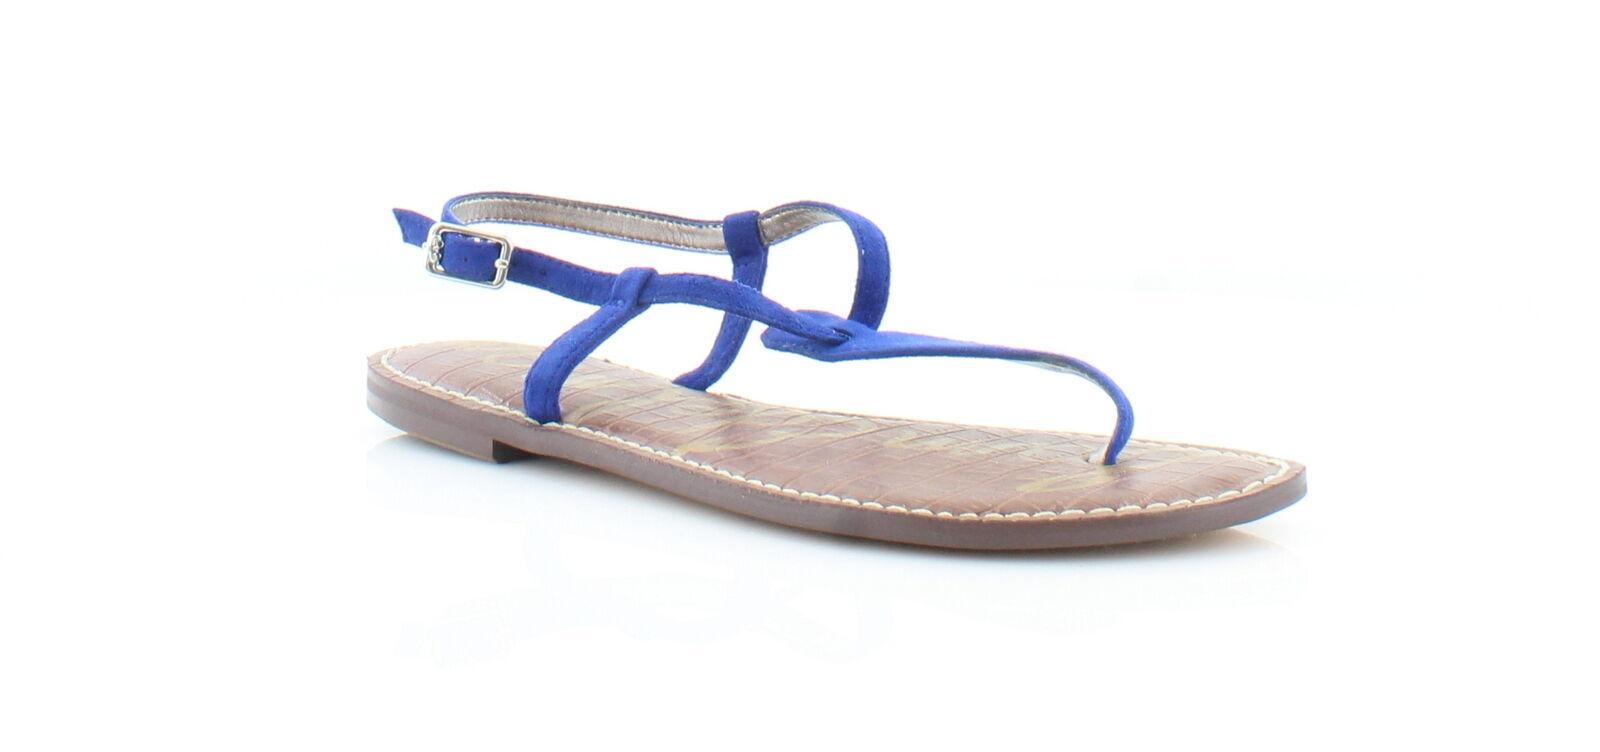 Sam 7.5 Edelman New Gigi Blue Womens Shoes Size 7.5 Sam M Sandals MSRP $60 0aa616